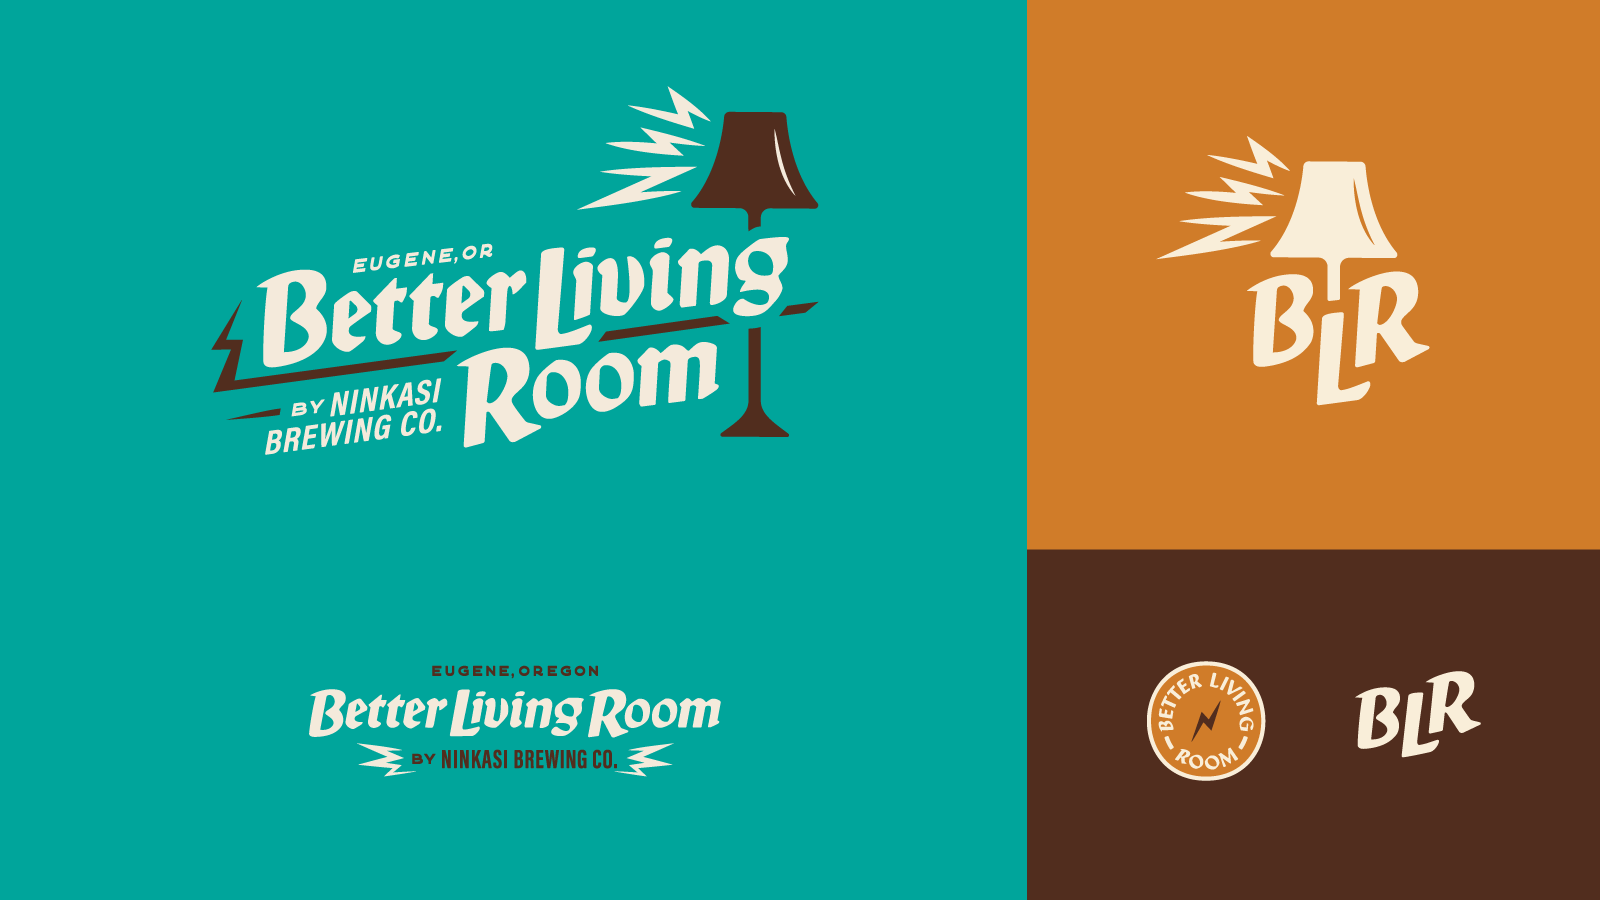 Logo lockups for Ninkasi Brewing Co. Better Living Room